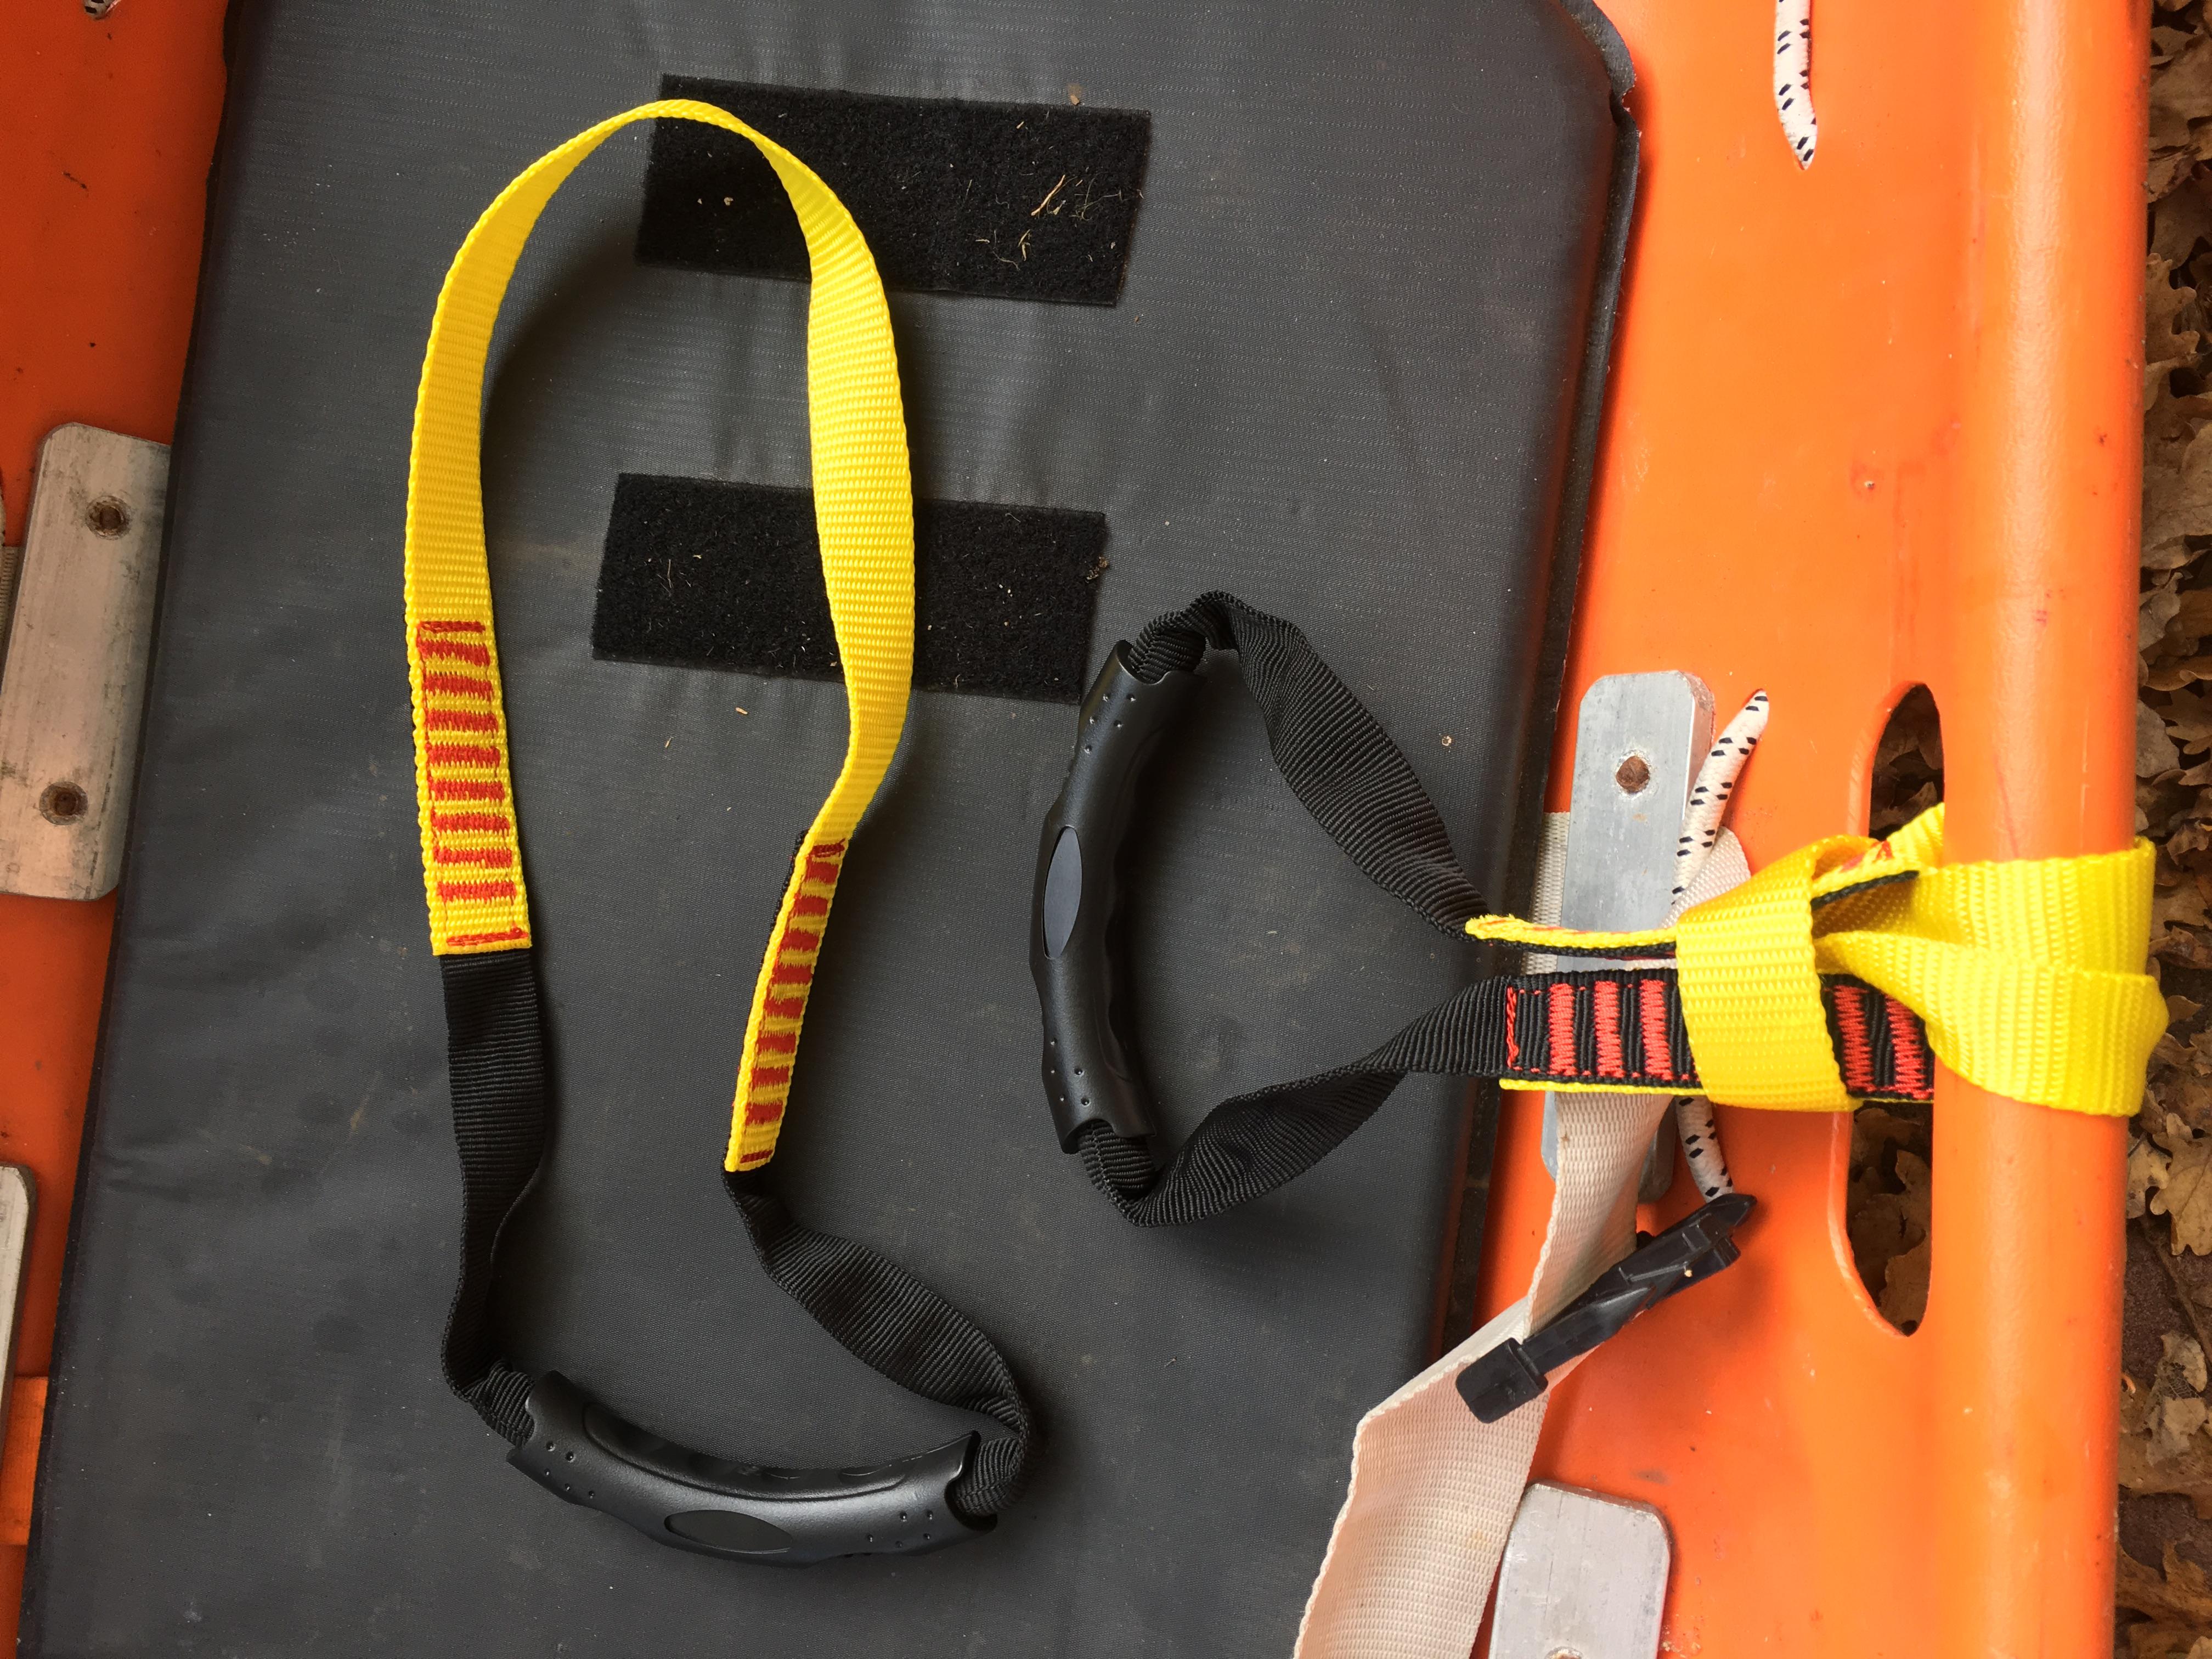 Saviour Carry EZ and Orange Basket